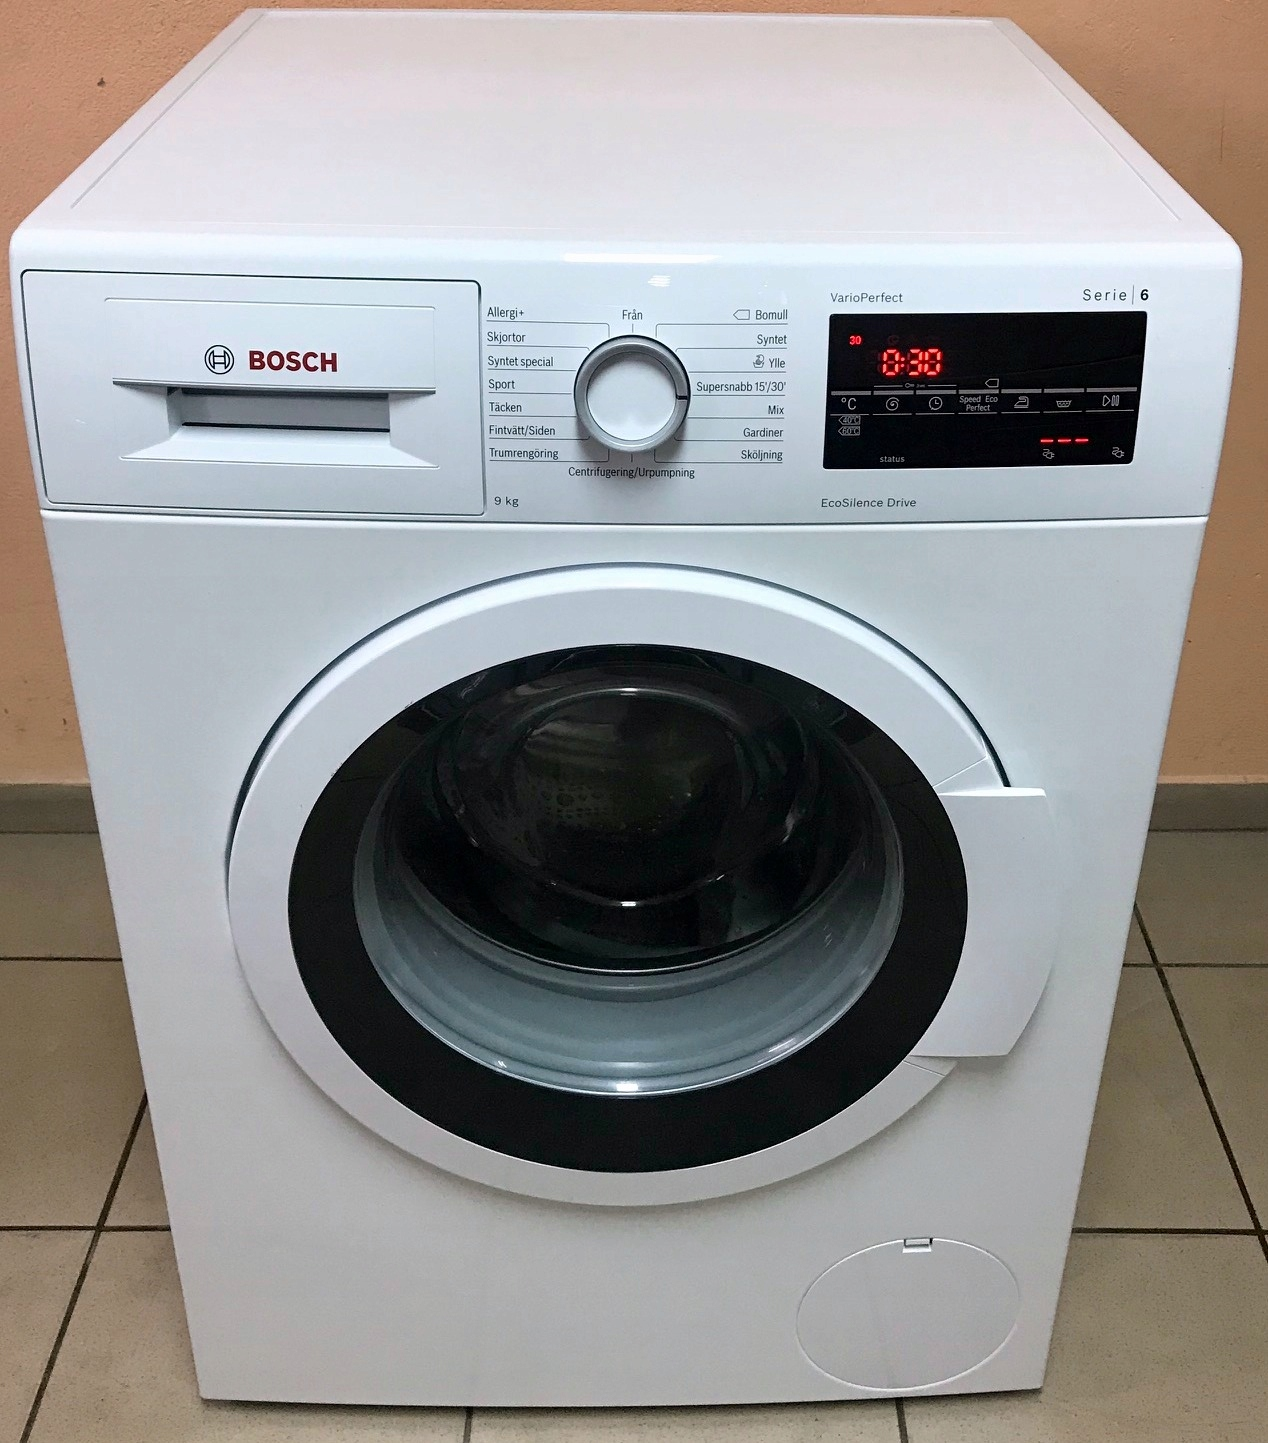 Pralka Bosch 9kg A+++(-30%) 1400obr/min idealna GW